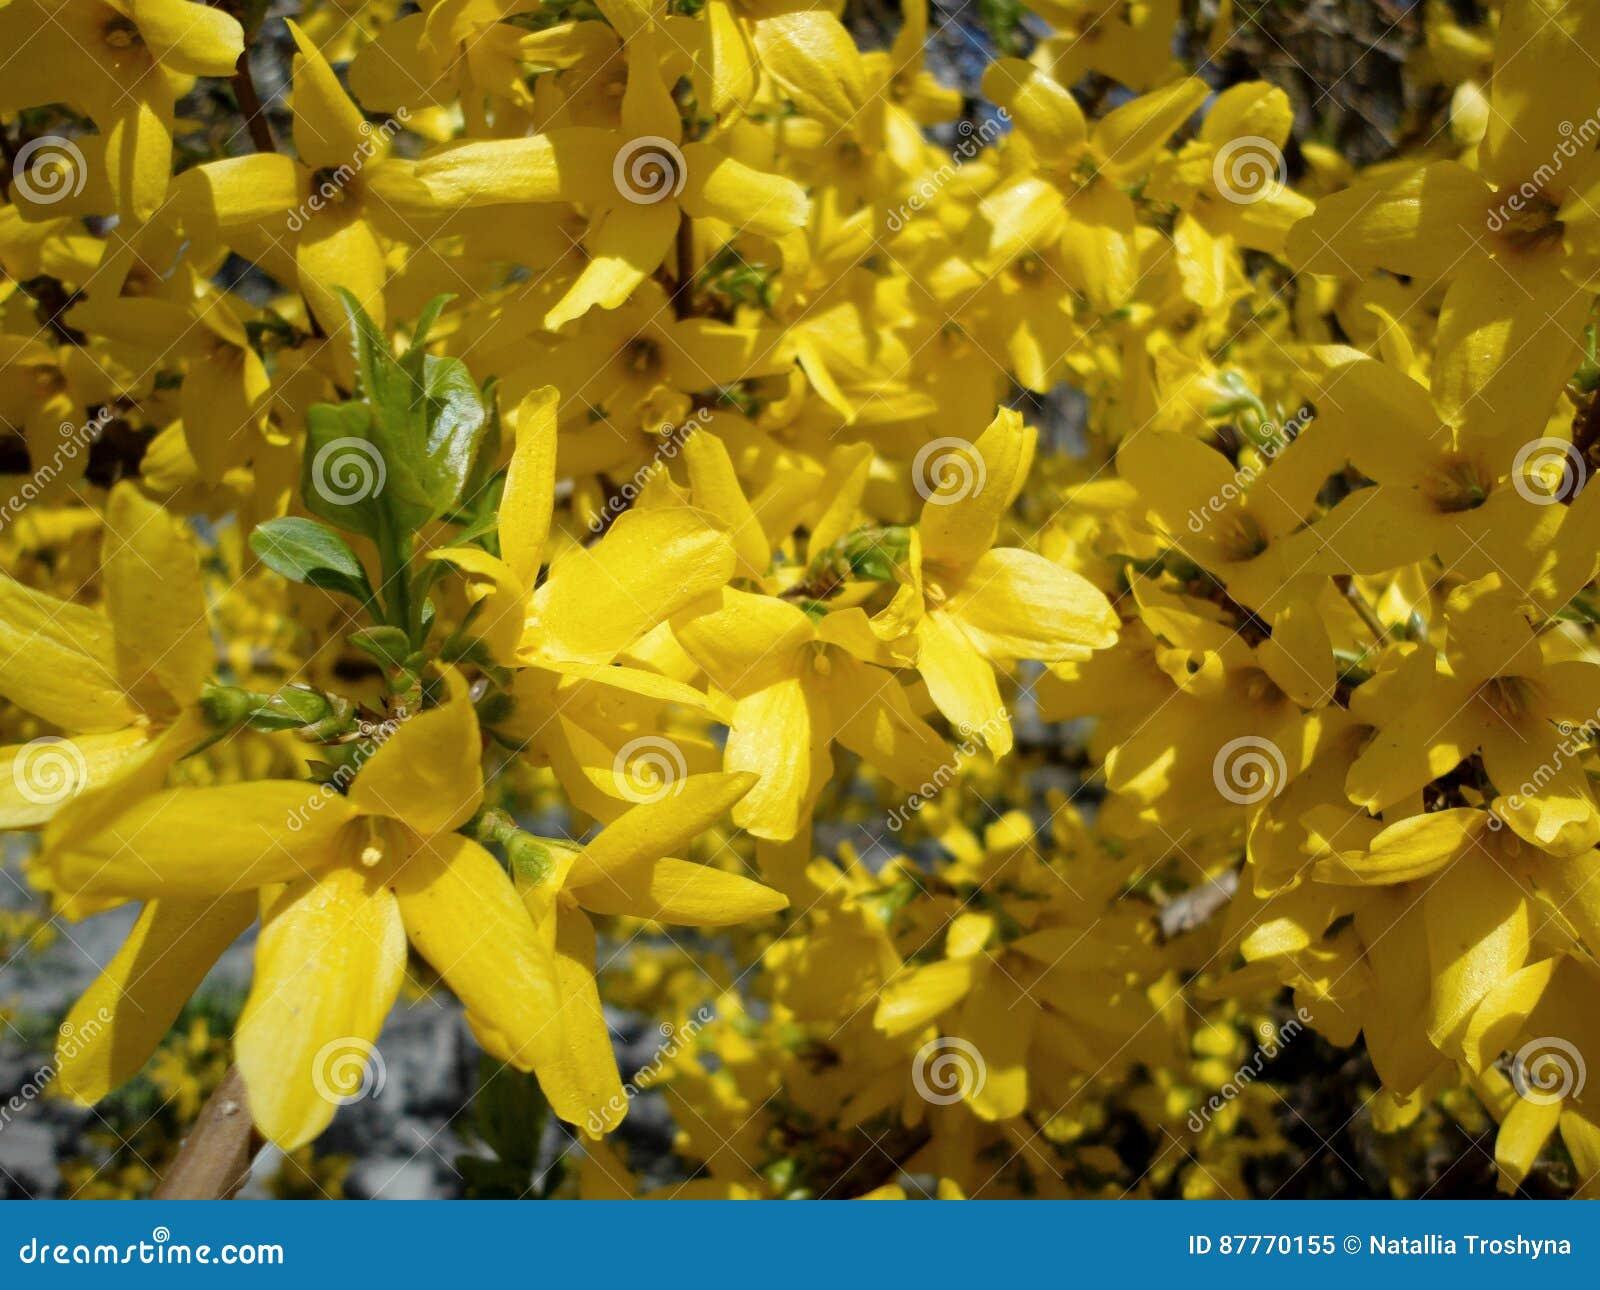 Spring blooming bush yellow flowers stock image image of spring blooming bush yellow flowers mightylinksfo